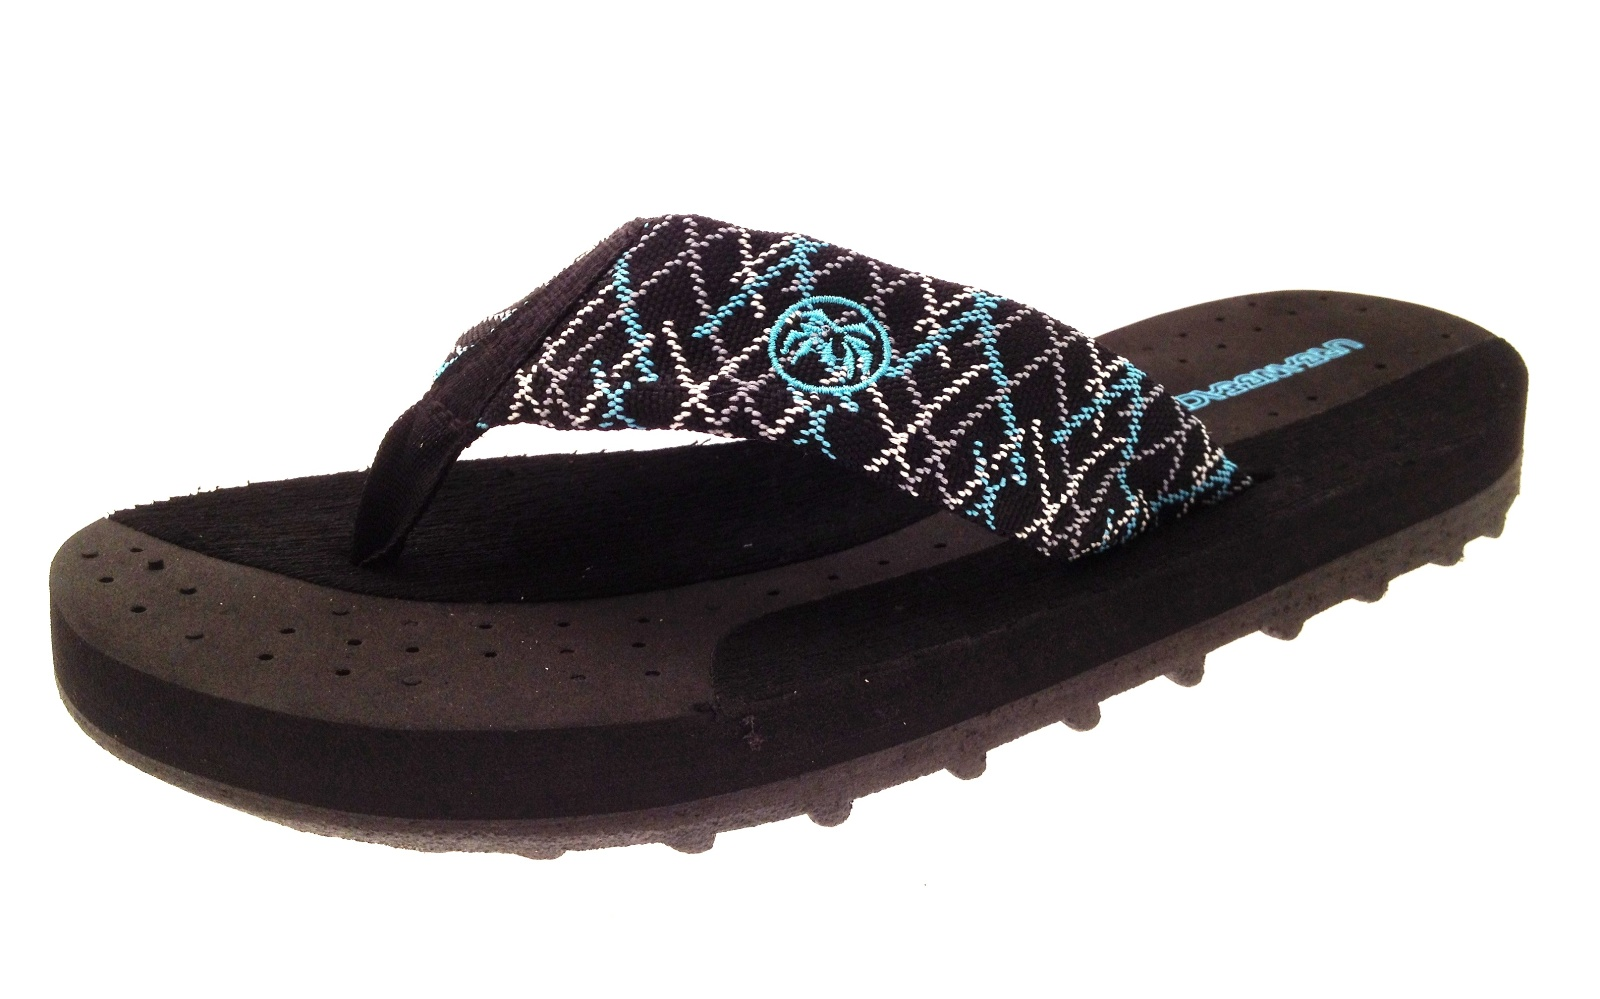 kids boys urban beach flip flops sandals summer holiday. Black Bedroom Furniture Sets. Home Design Ideas